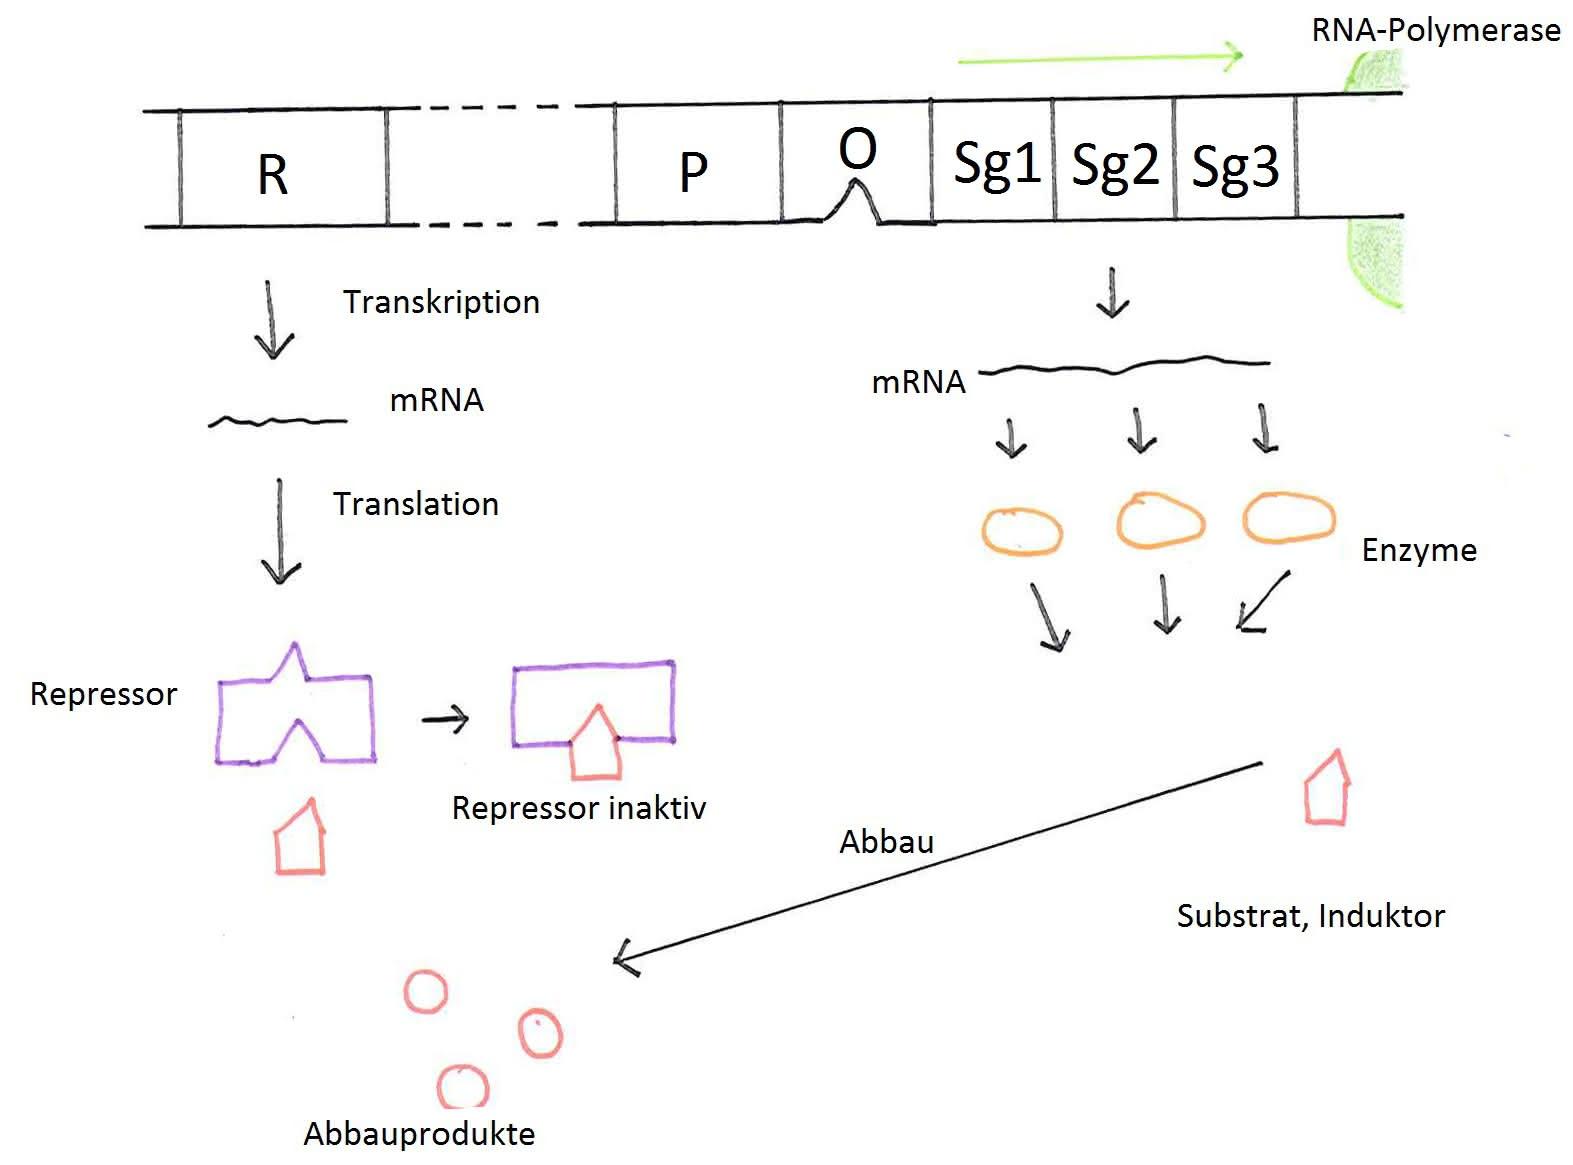 genetik genregulation bei prokaryoten operon modell. Black Bedroom Furniture Sets. Home Design Ideas